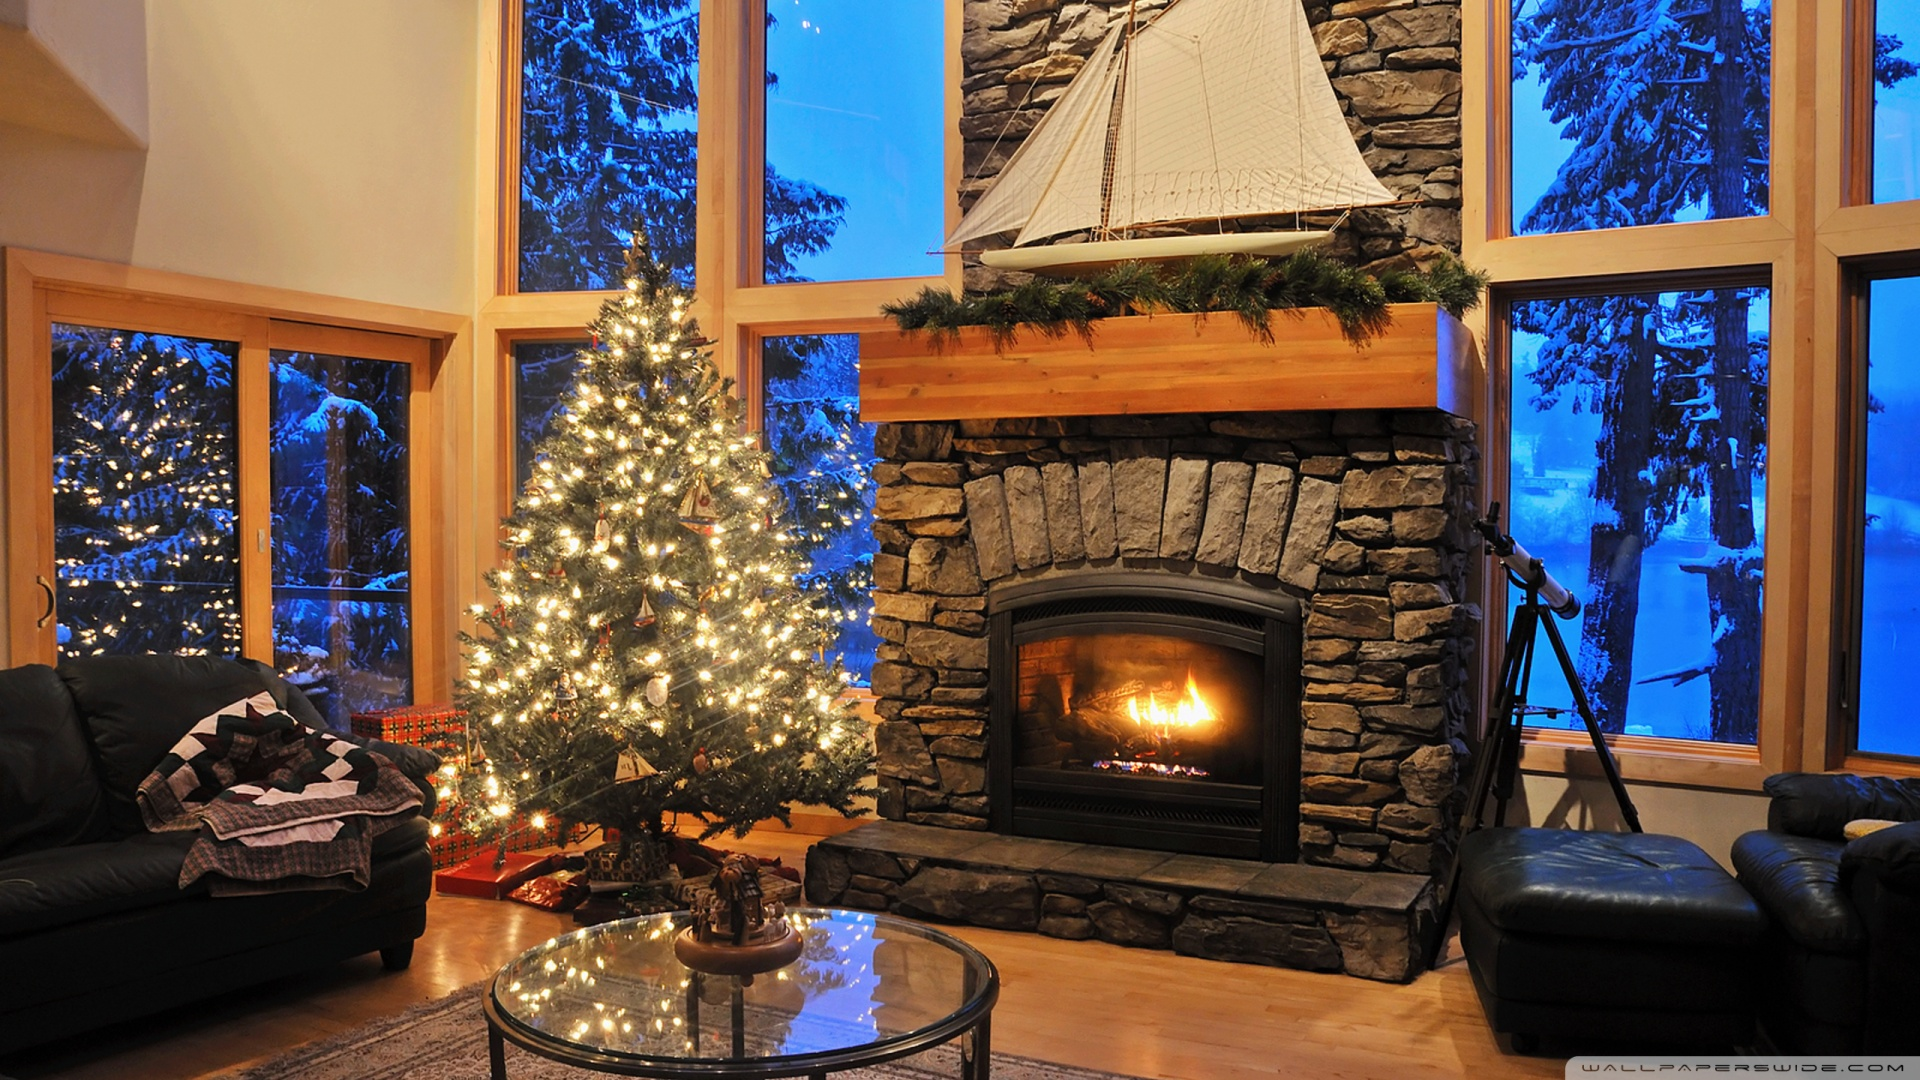 Fireplace Christmas Wallpaper 1920x1080 Fireplace Christmas 1920x1080